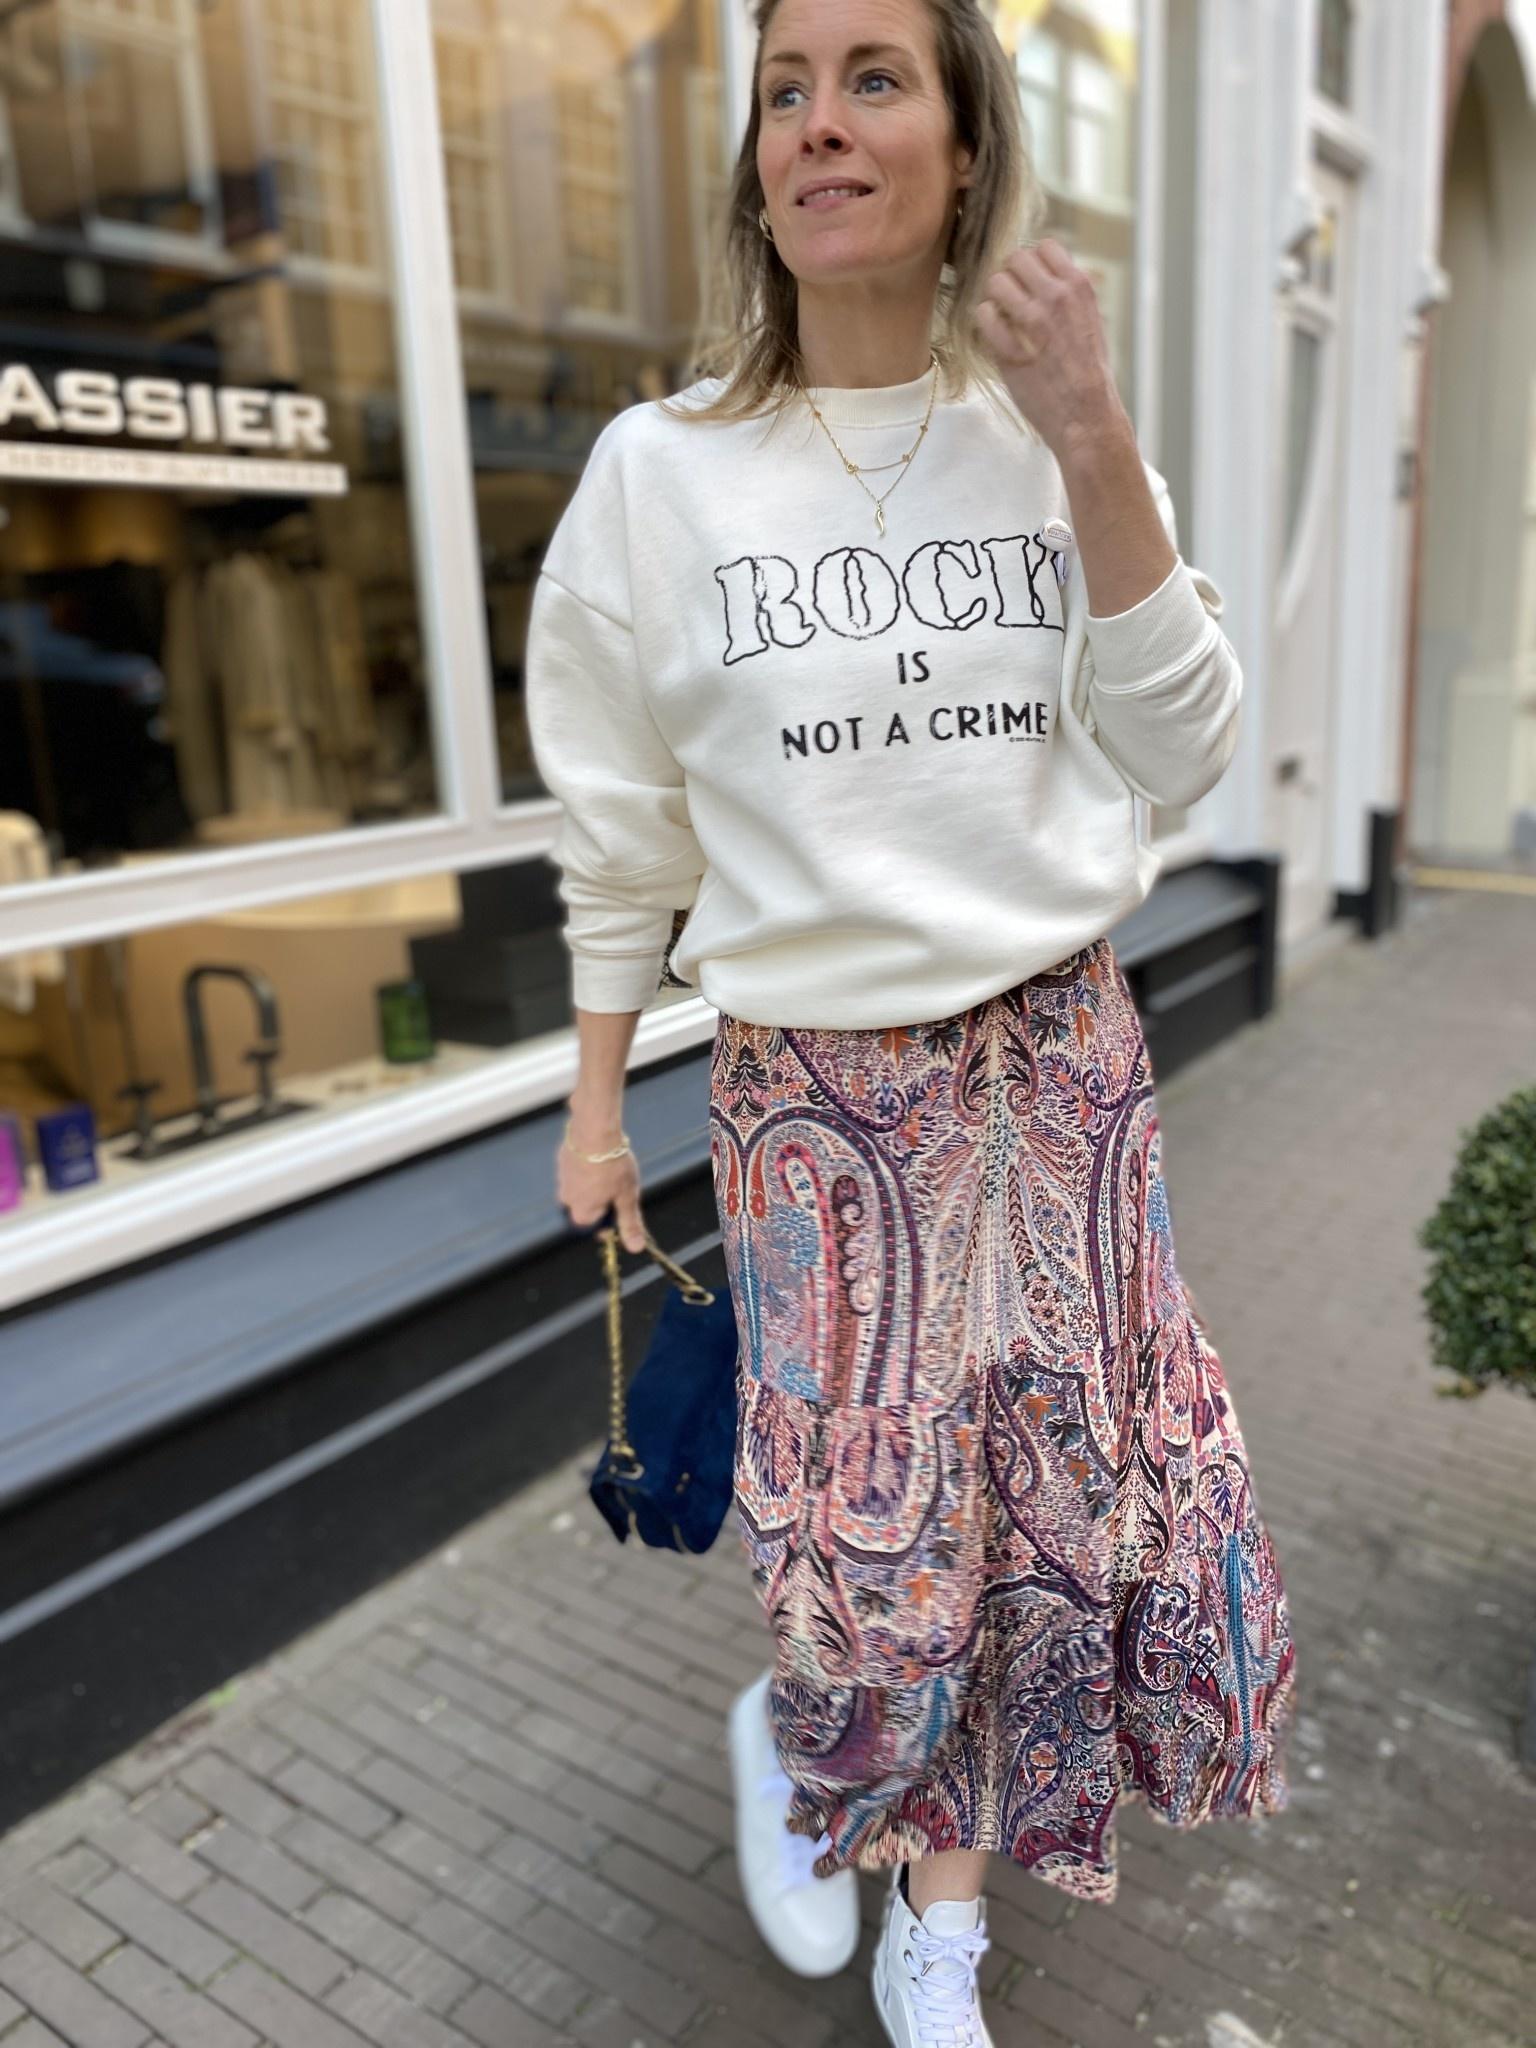 Sweater Roller Crime-1